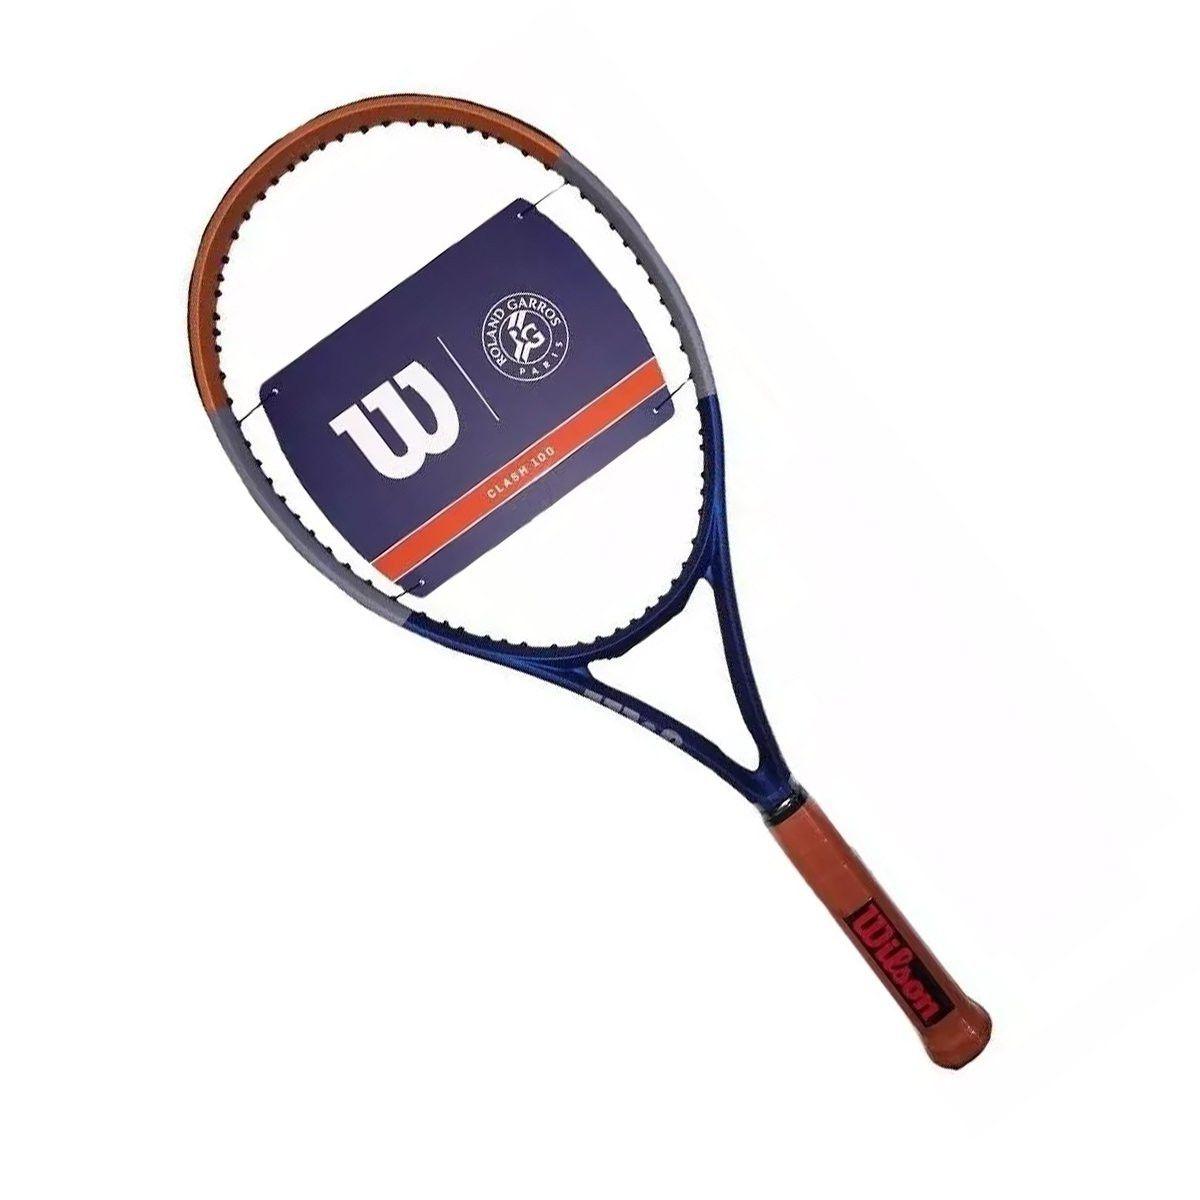 Raquete de Tênis Wilson Clash 100 - Roland Garros 2020